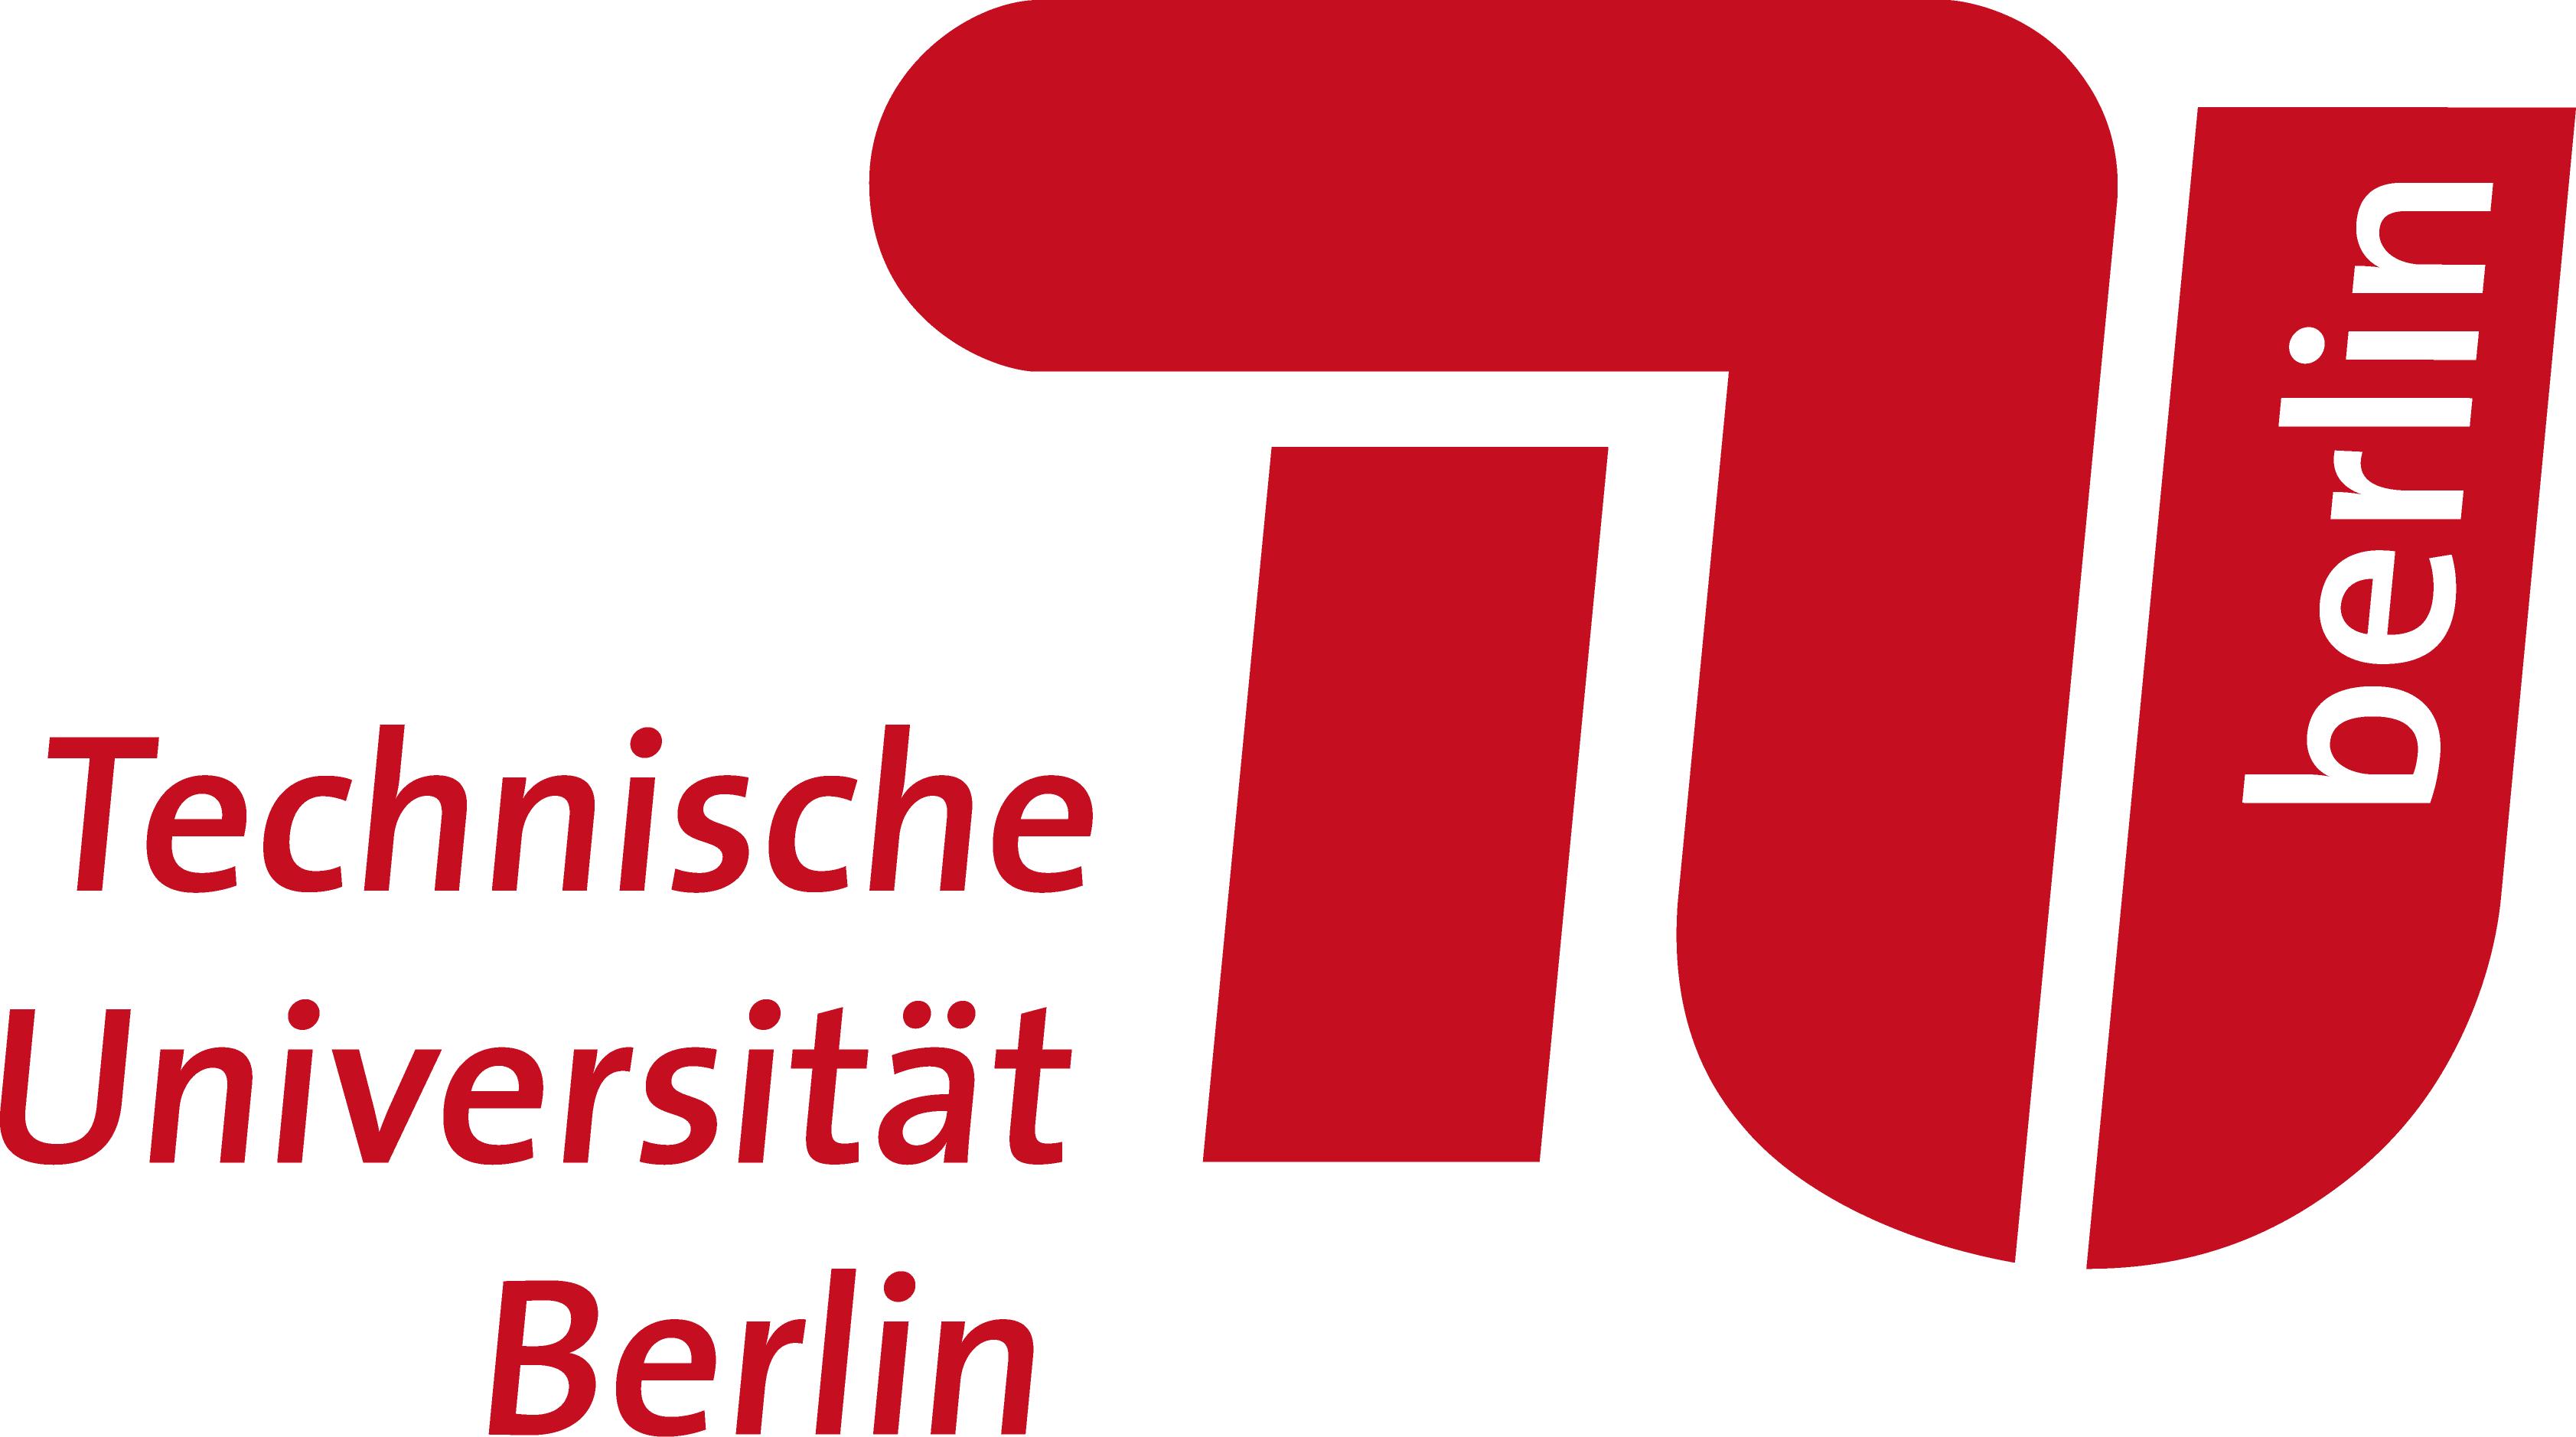 Technical University of Berlin logo